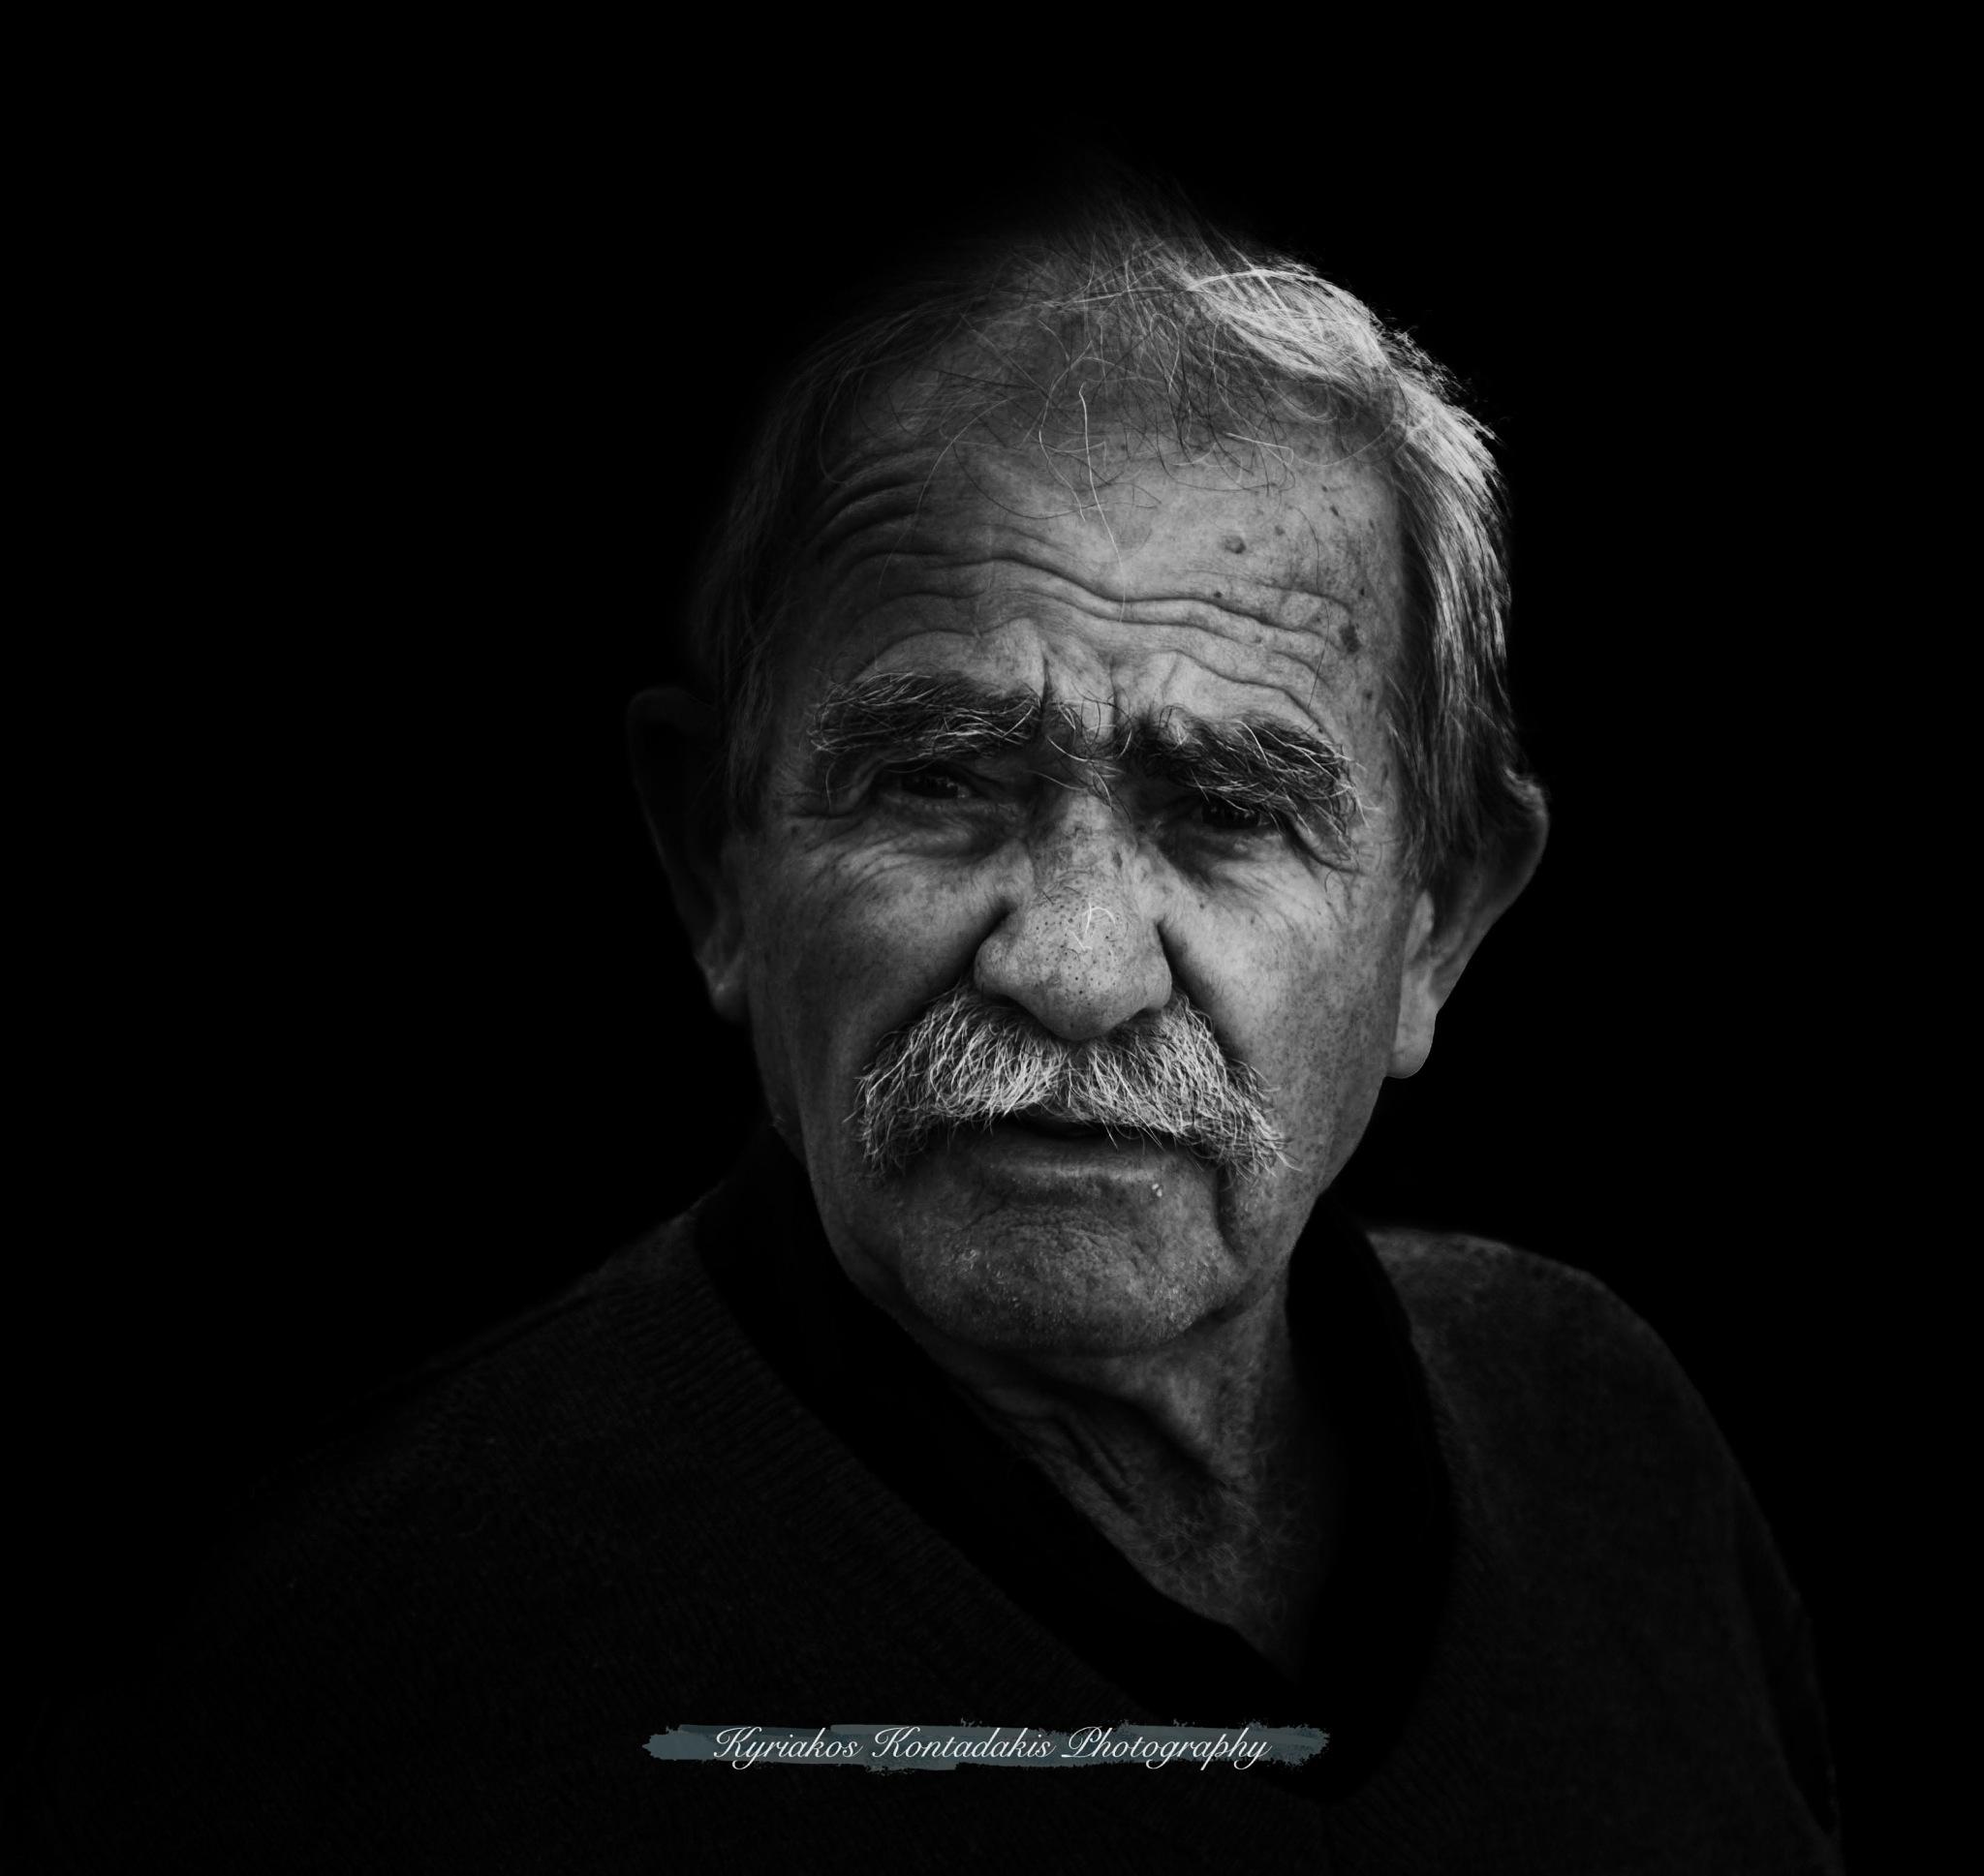 The Father by Kontadakis Kyriakos